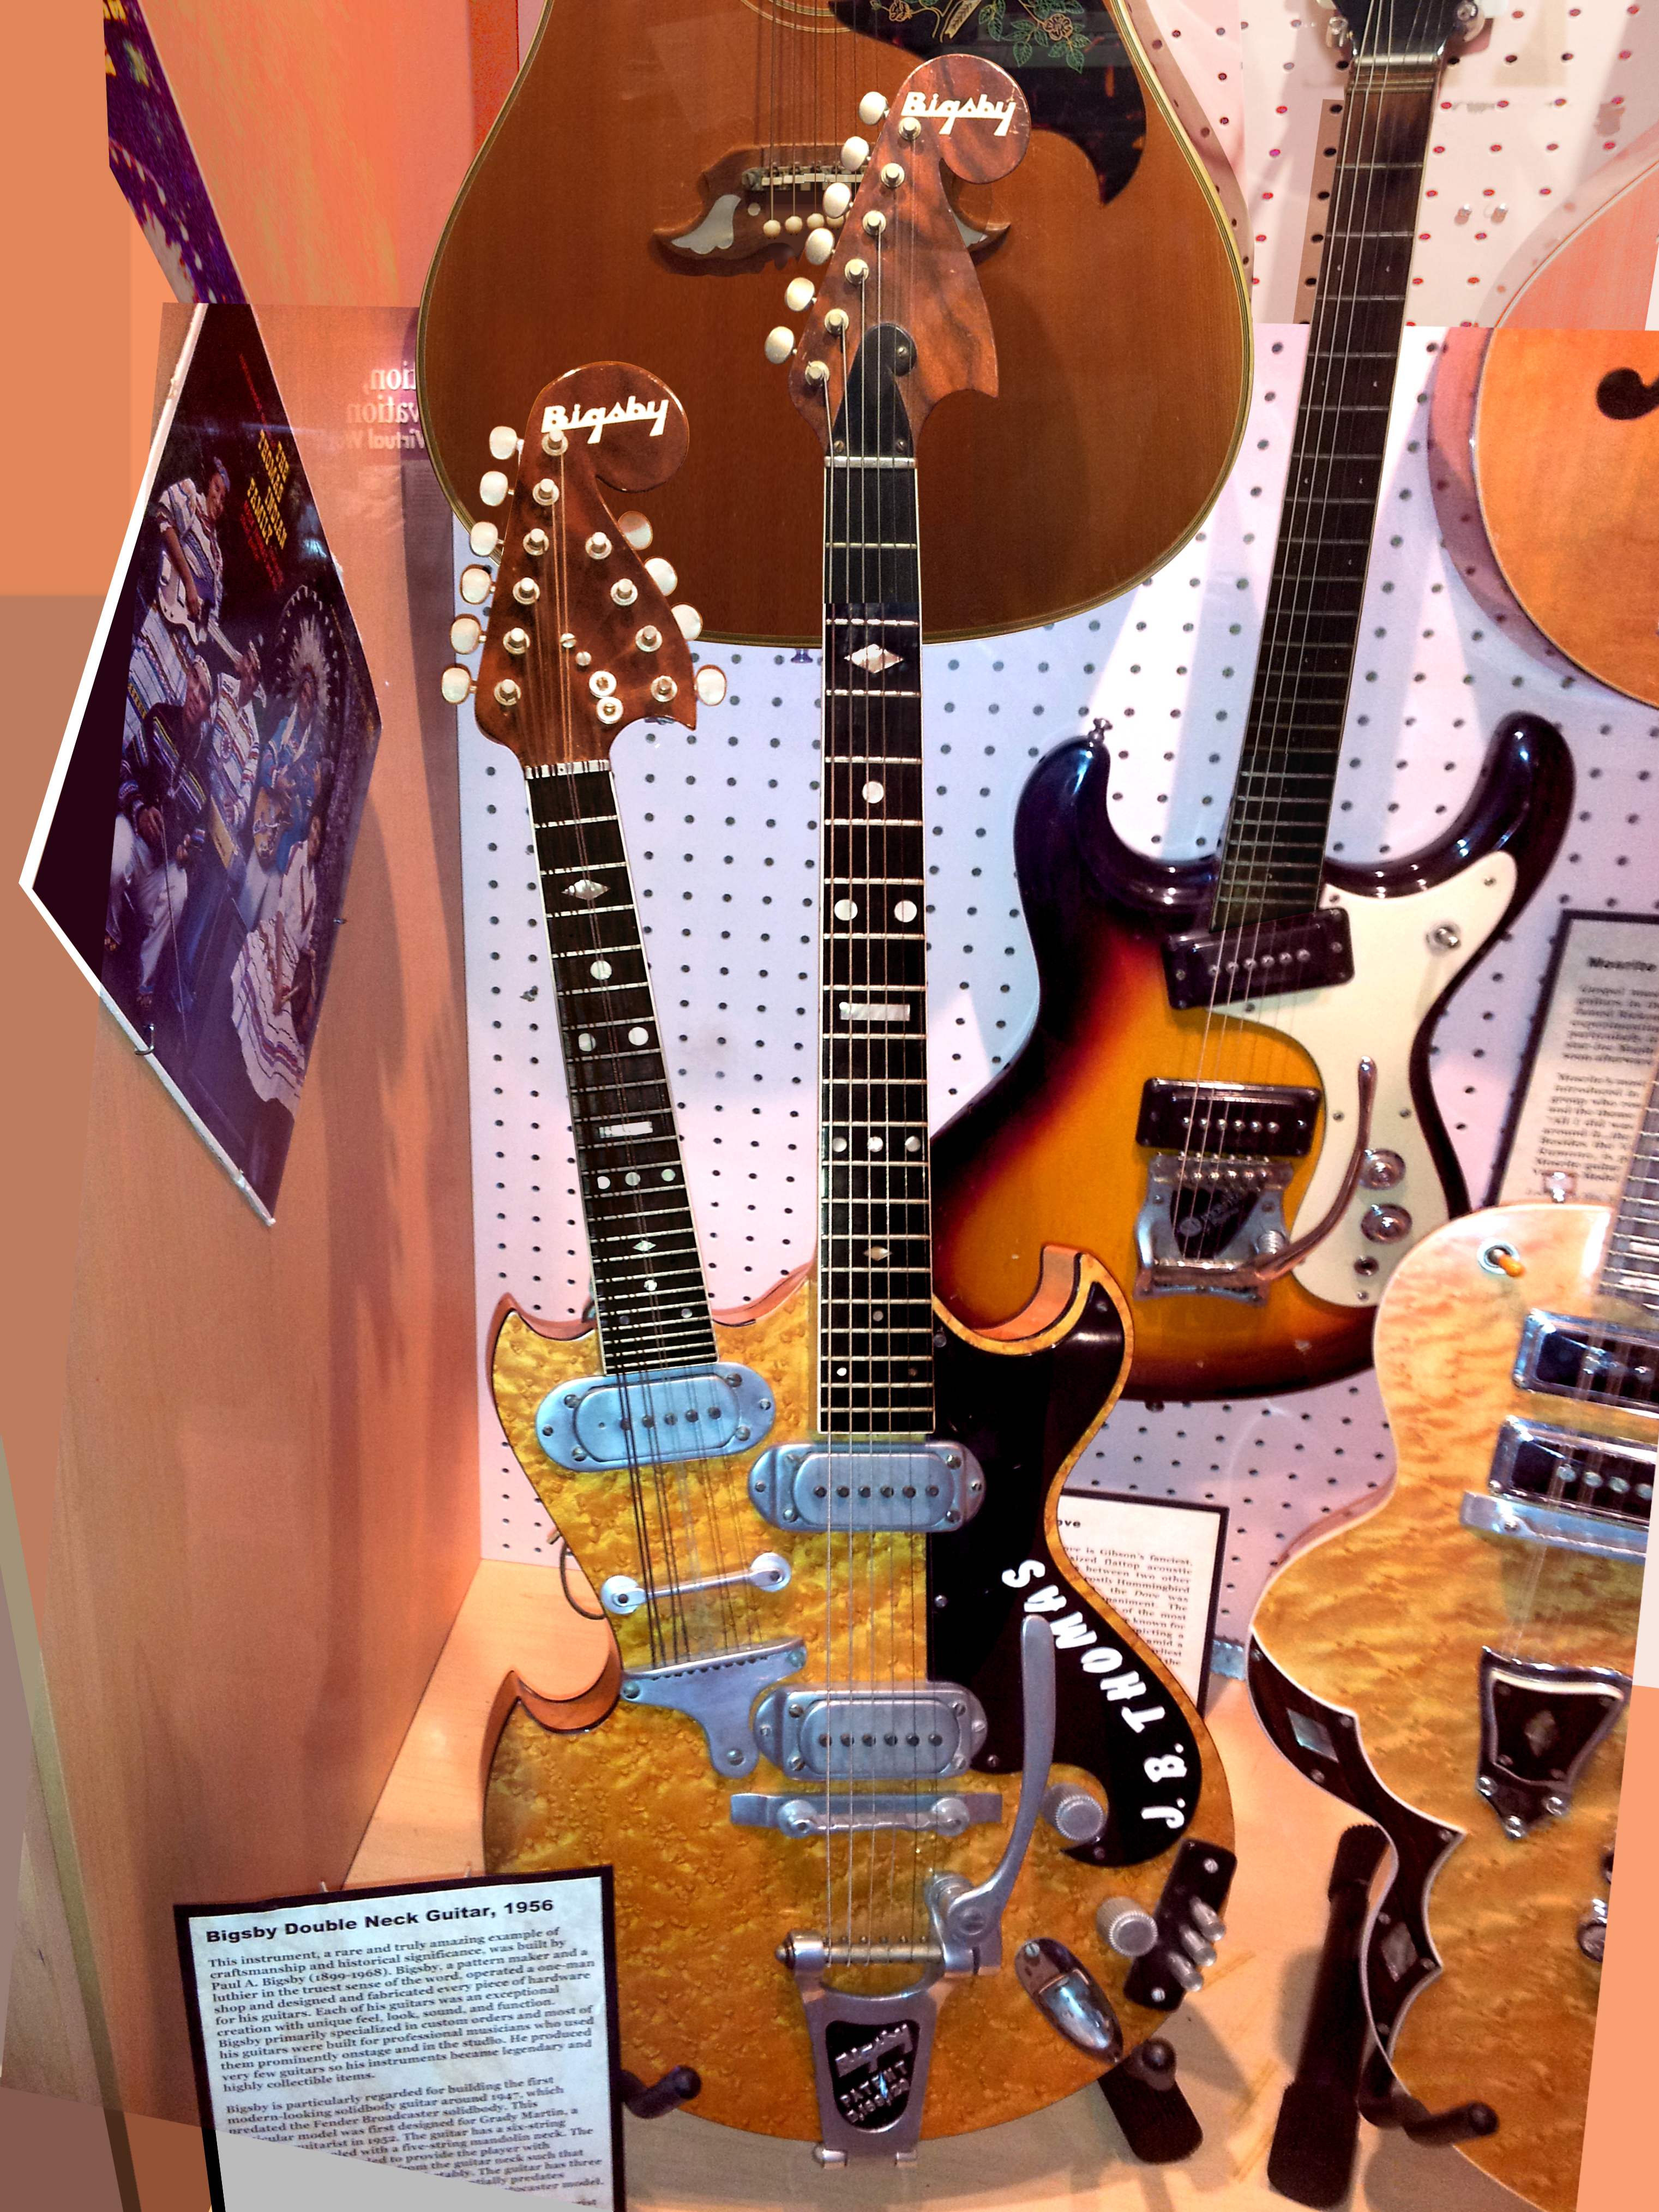 Mosrite Guitars History Guitar Wiring Diagram File Bigsby Double Neck Harvey 3042x4056